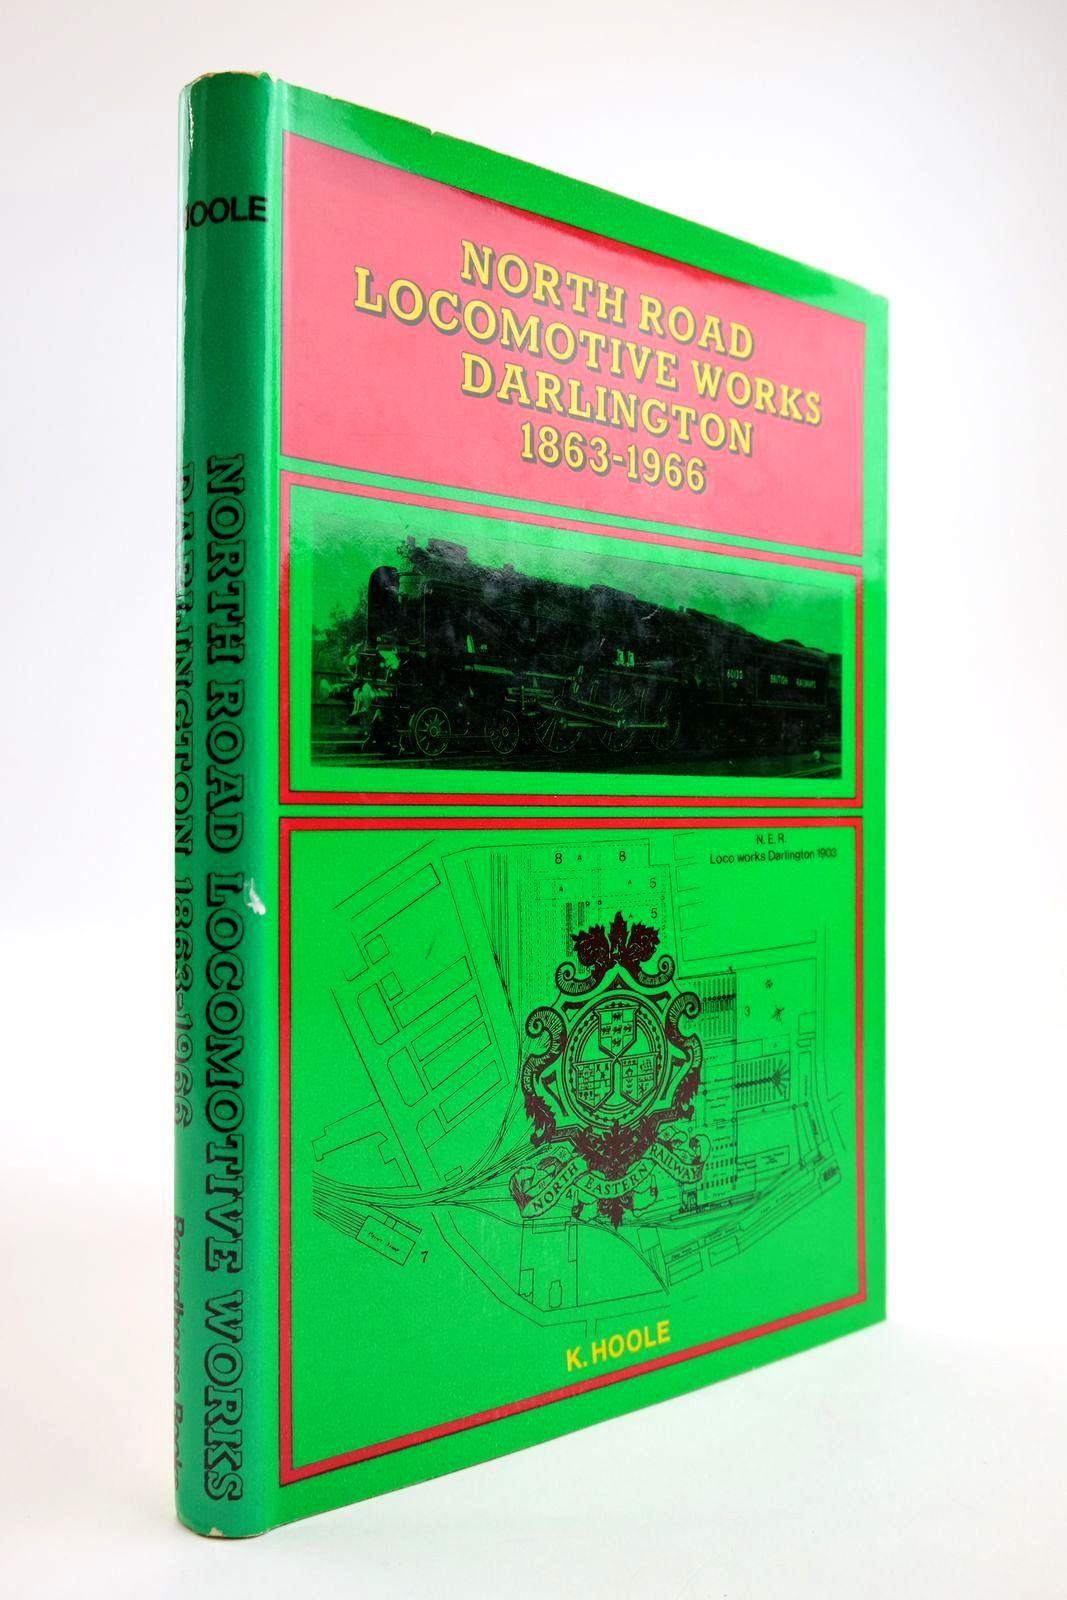 Photo of NORTH ROAD LOCOMOTIVE WORKS DARLINGTON 1863-1966- Stock Number: 2133619